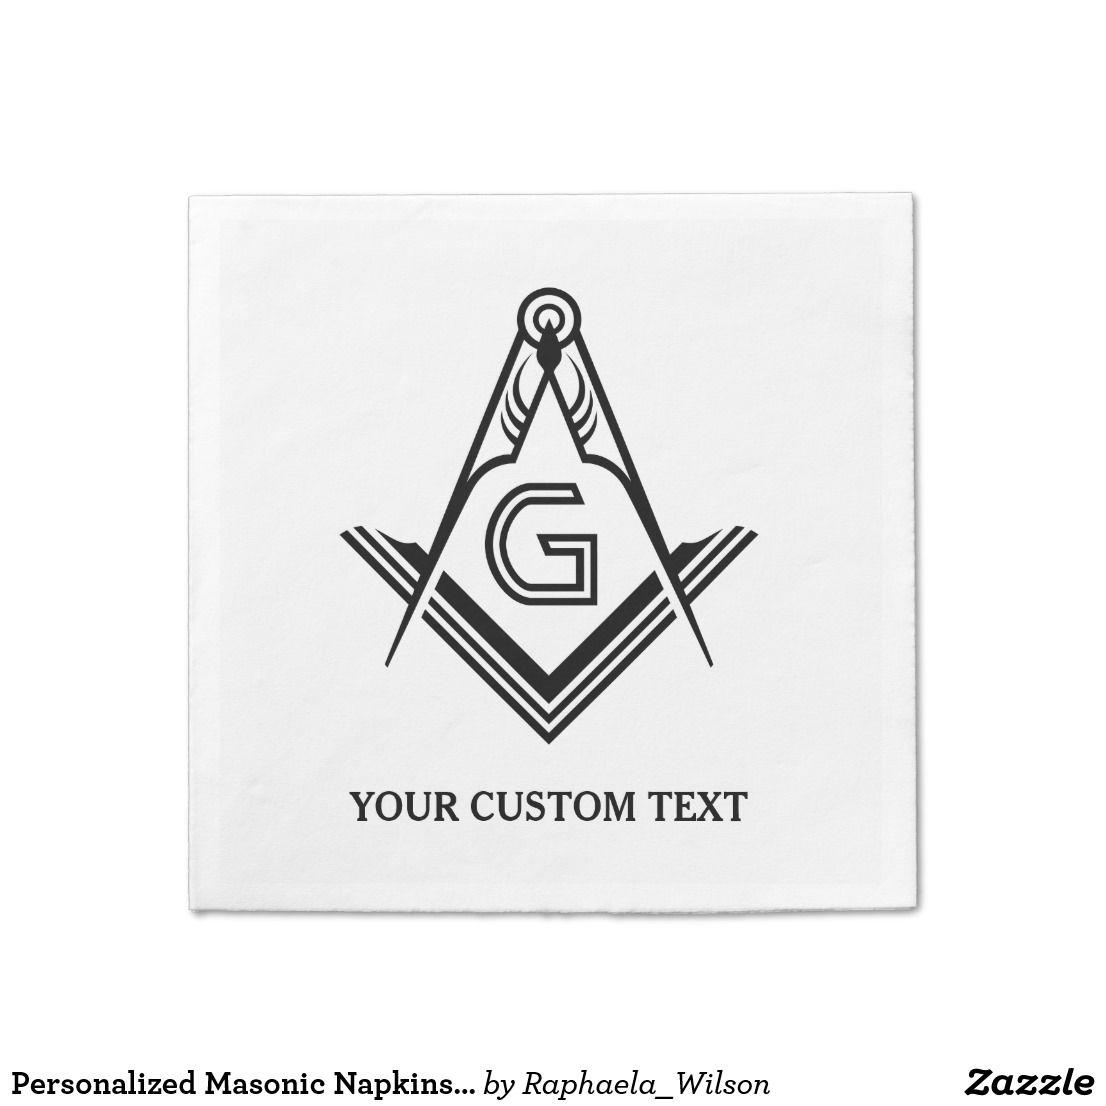 Personalized Masonic Napkins and Decorations | Custom Masonic Gifts ...